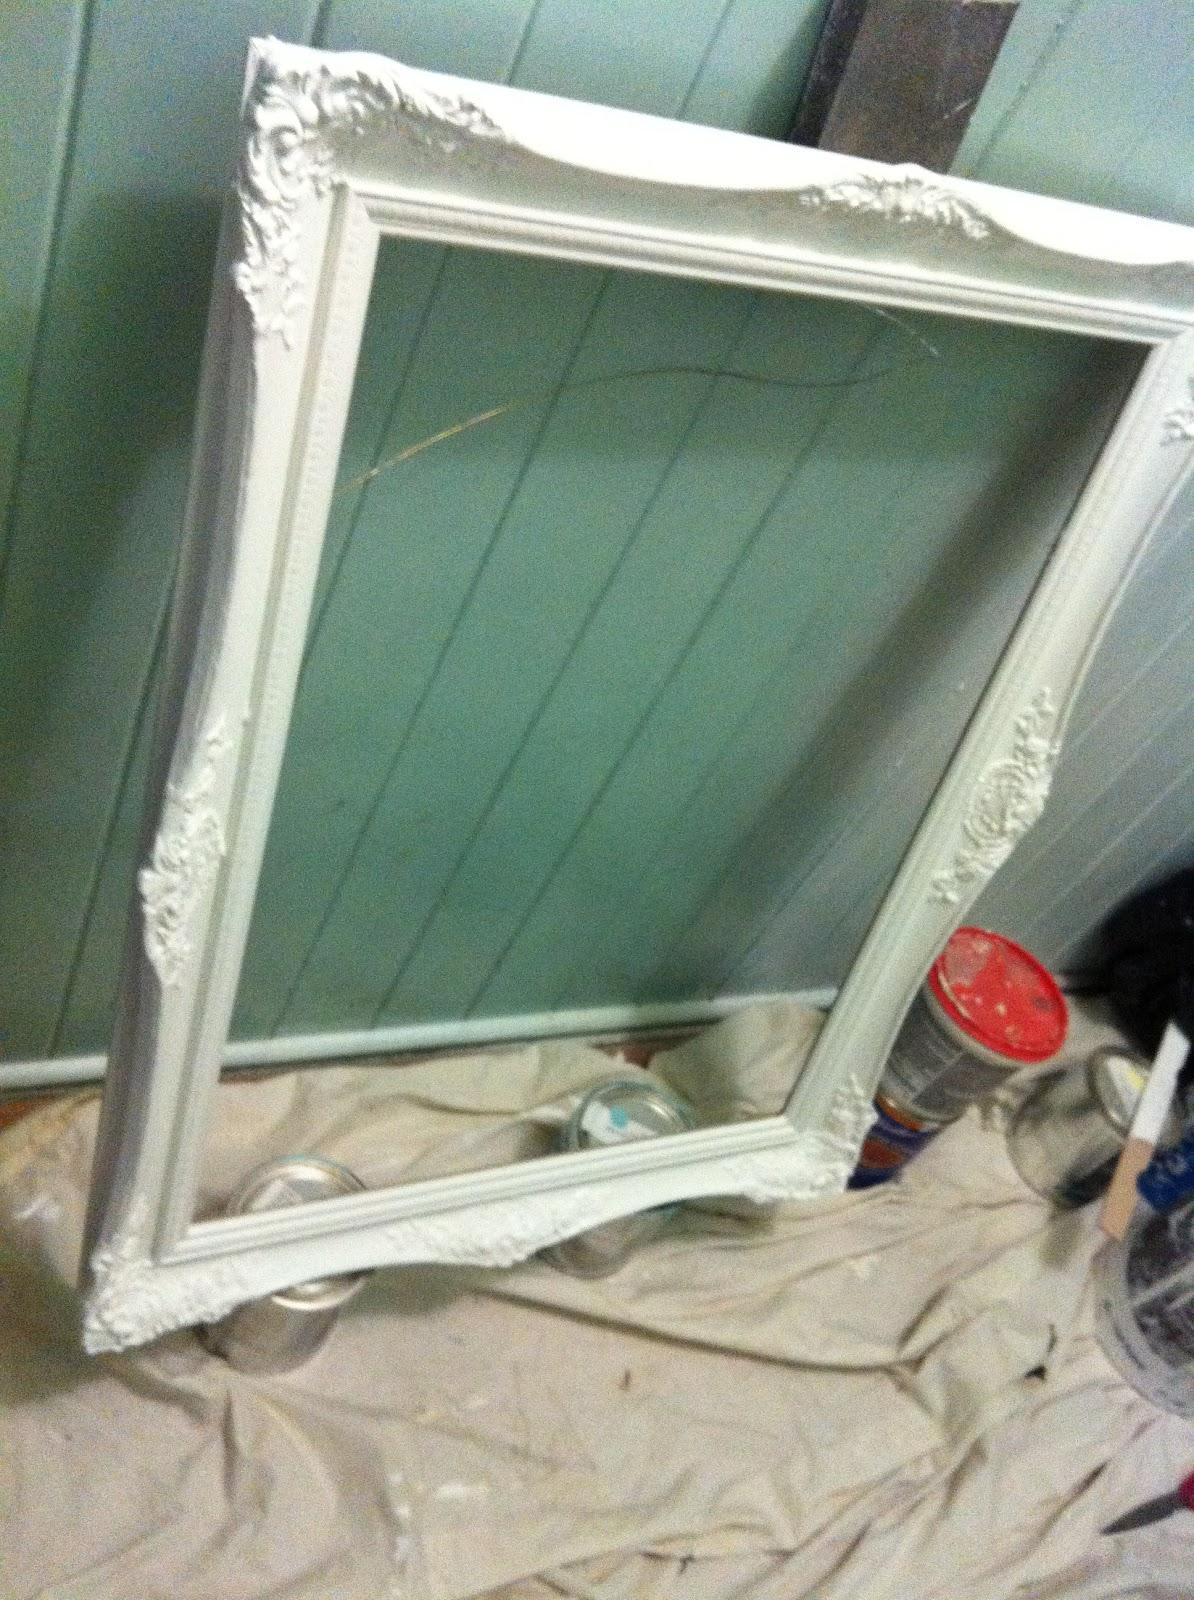 Divine Decor on a Dime: How to make a Framed Chalkboard